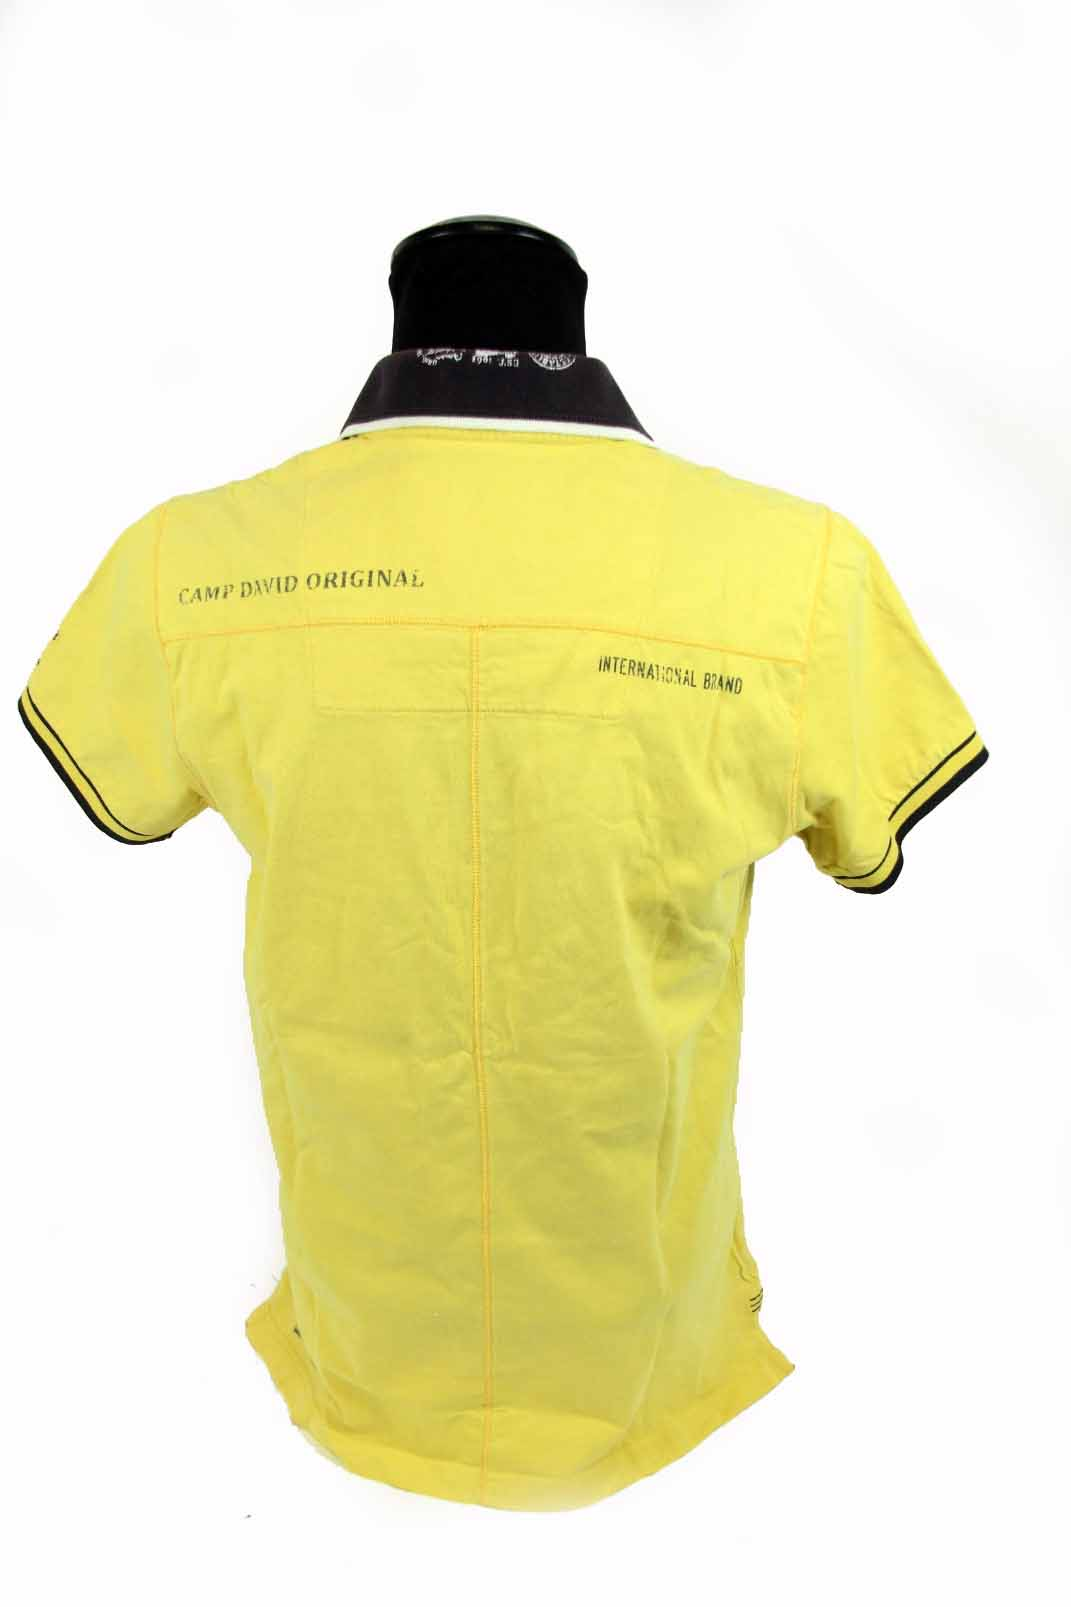 original camp david herren poloshirt gr m gelb t shirt kurzarm polo shirt ebay. Black Bedroom Furniture Sets. Home Design Ideas